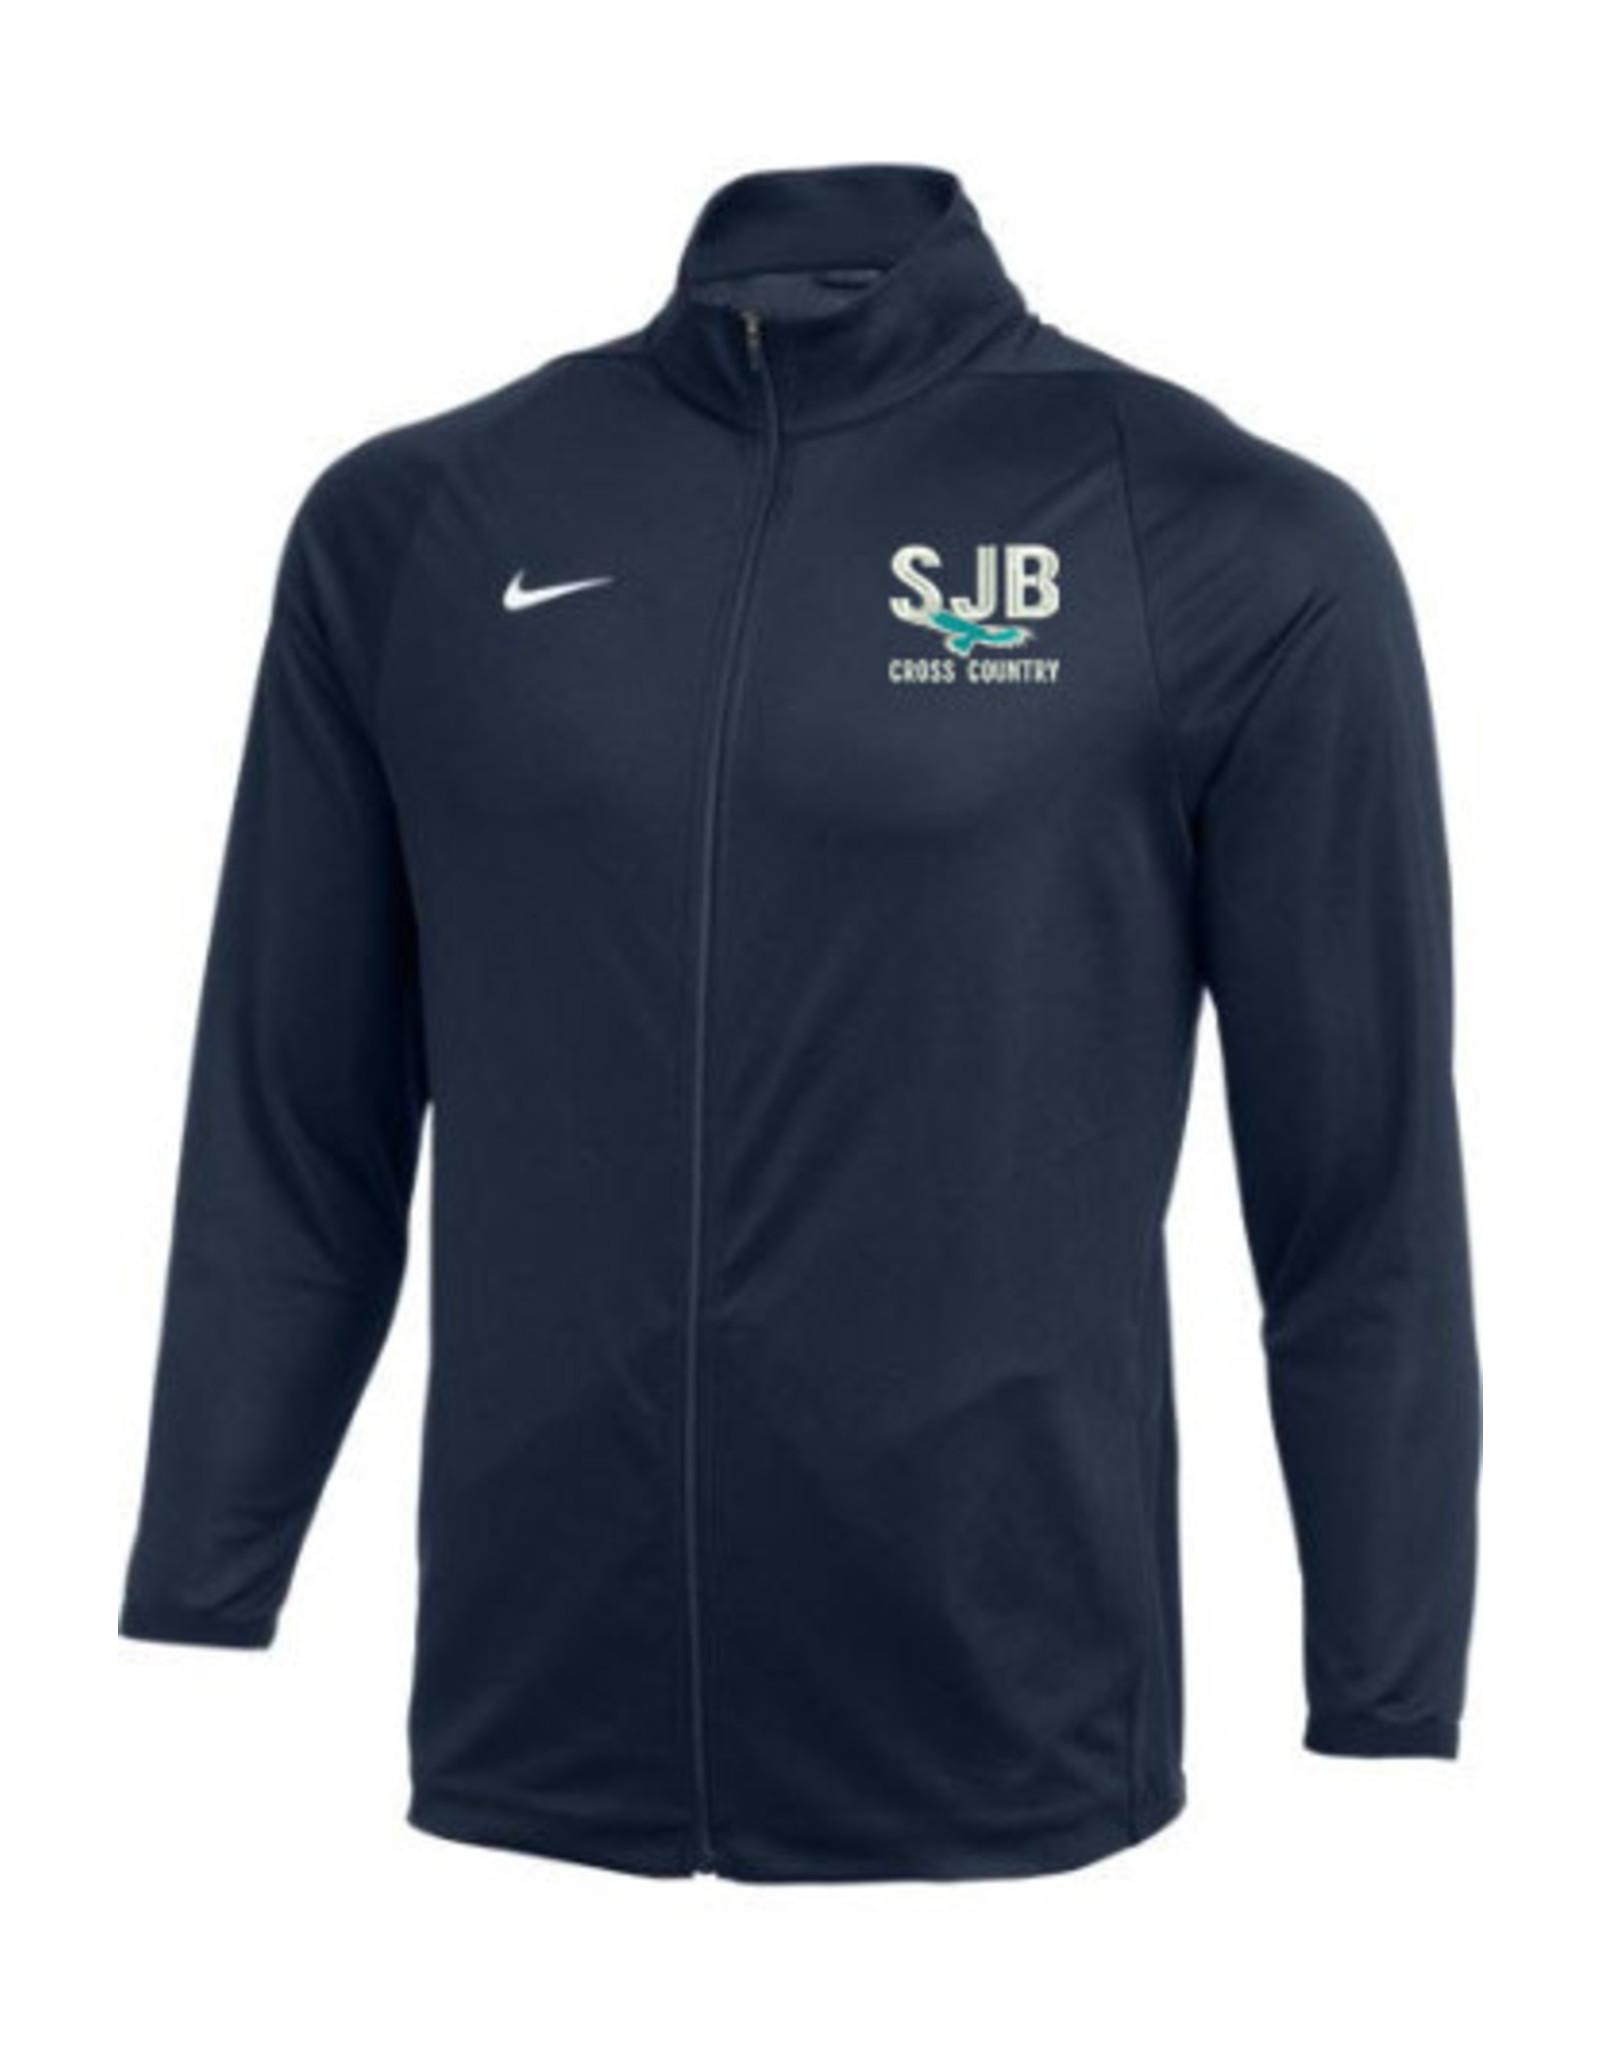 UNIFORM SJB Cross Country Full Zip Jacket